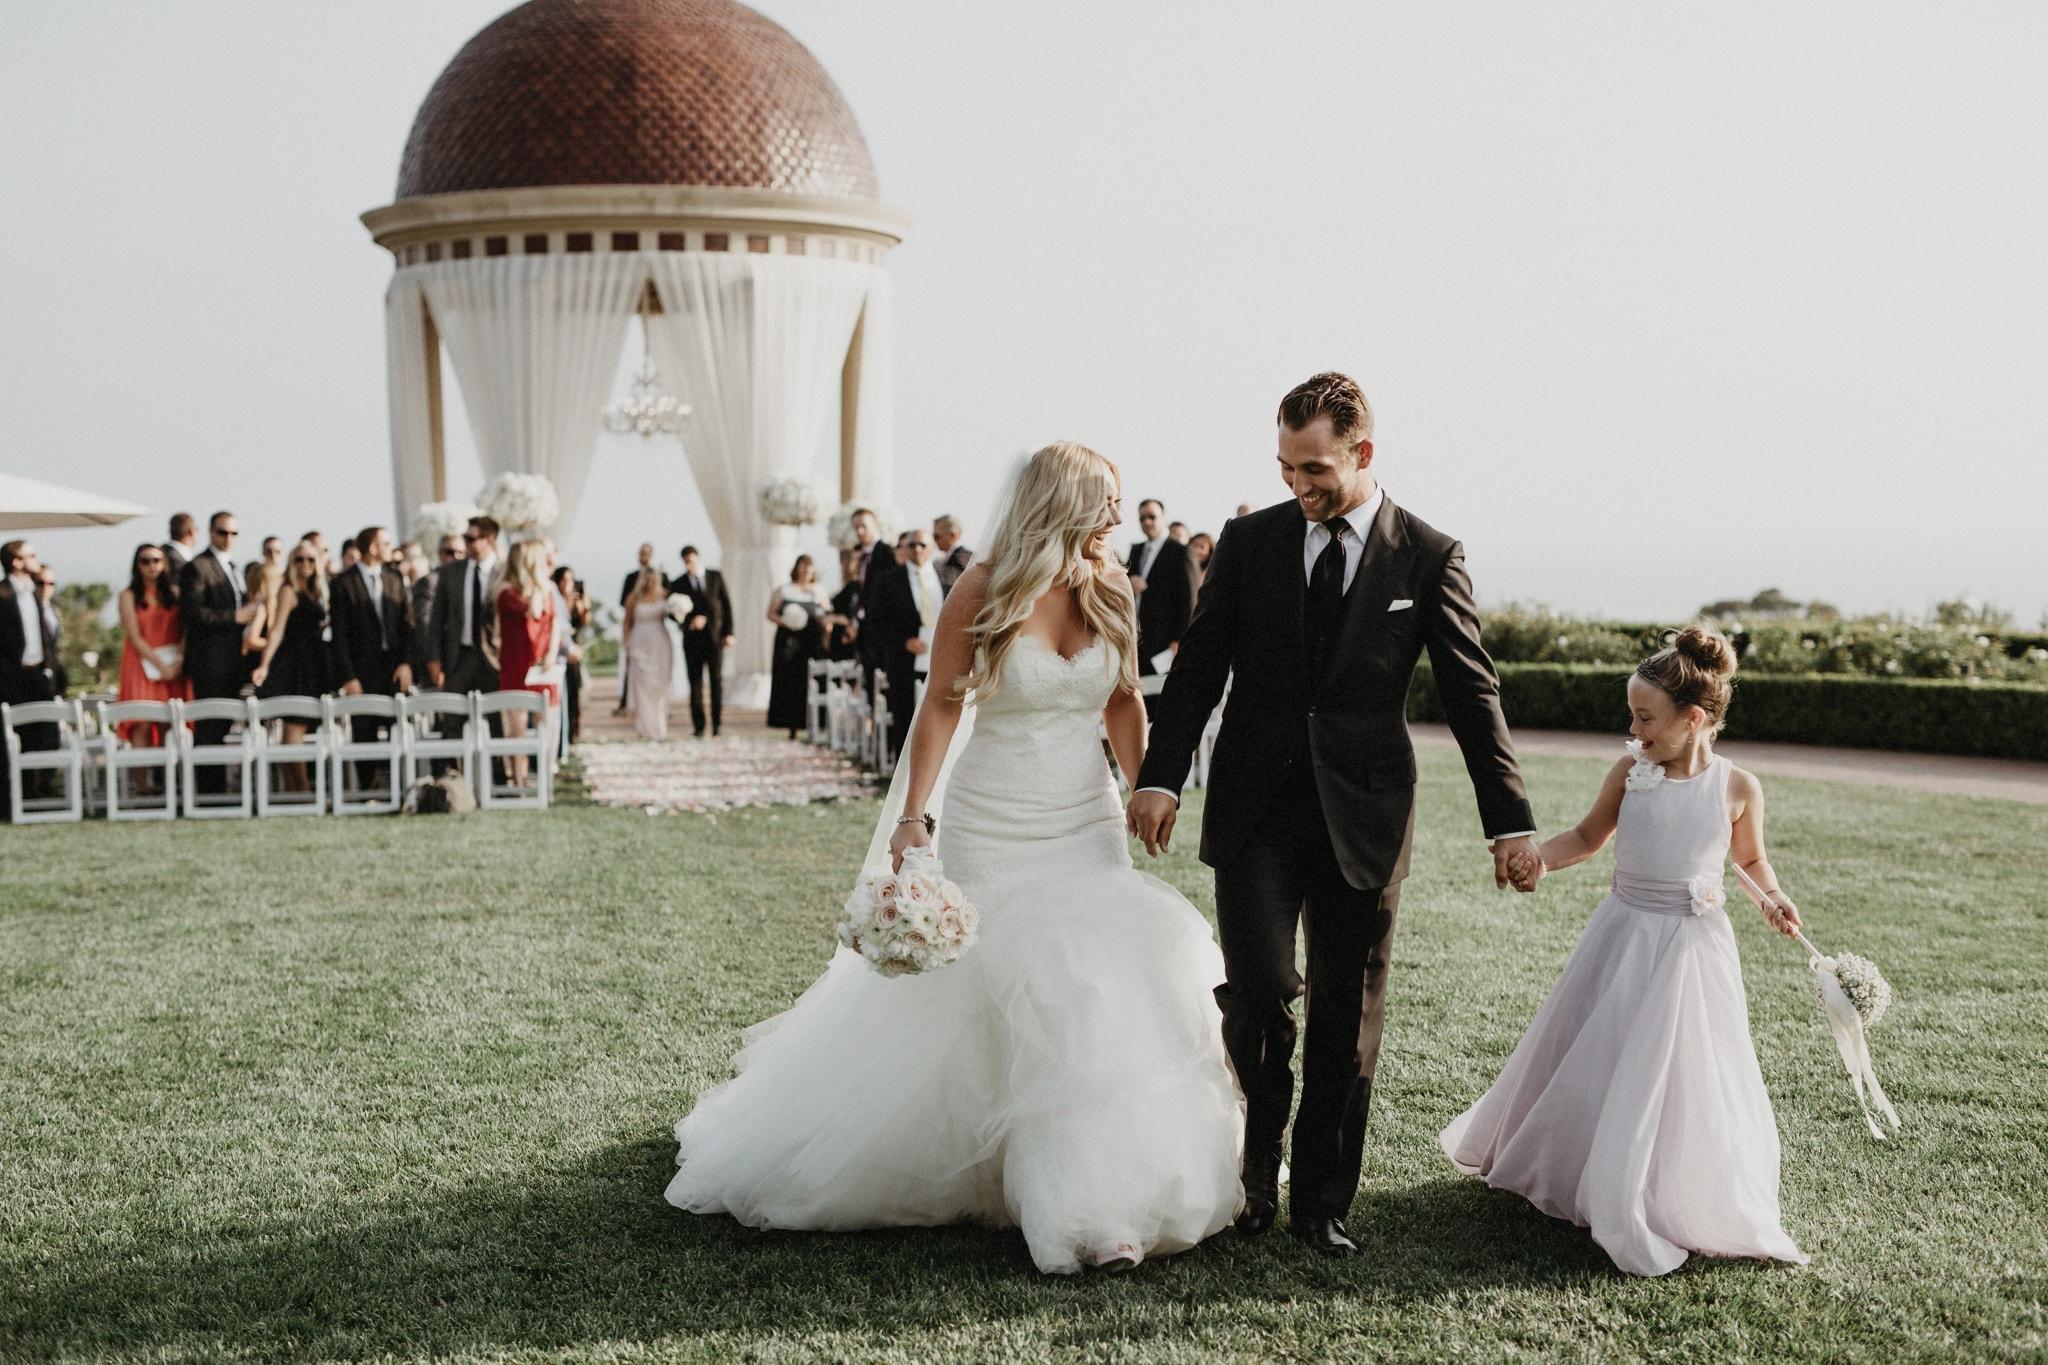 052-the-resort-at-pelican-hill-wedding.jpg